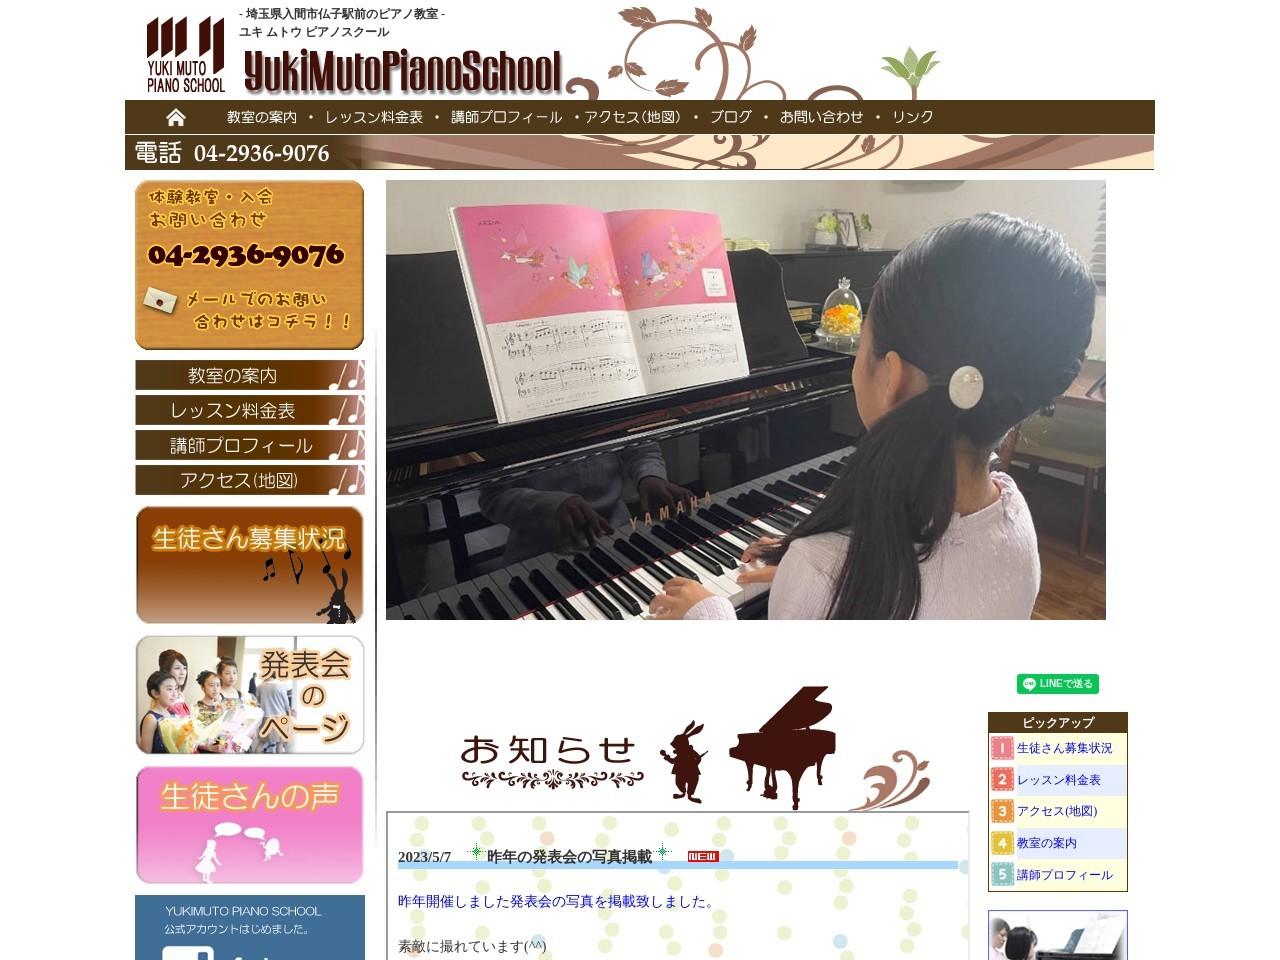 Yuki Muto Piano Schoolのサムネイル